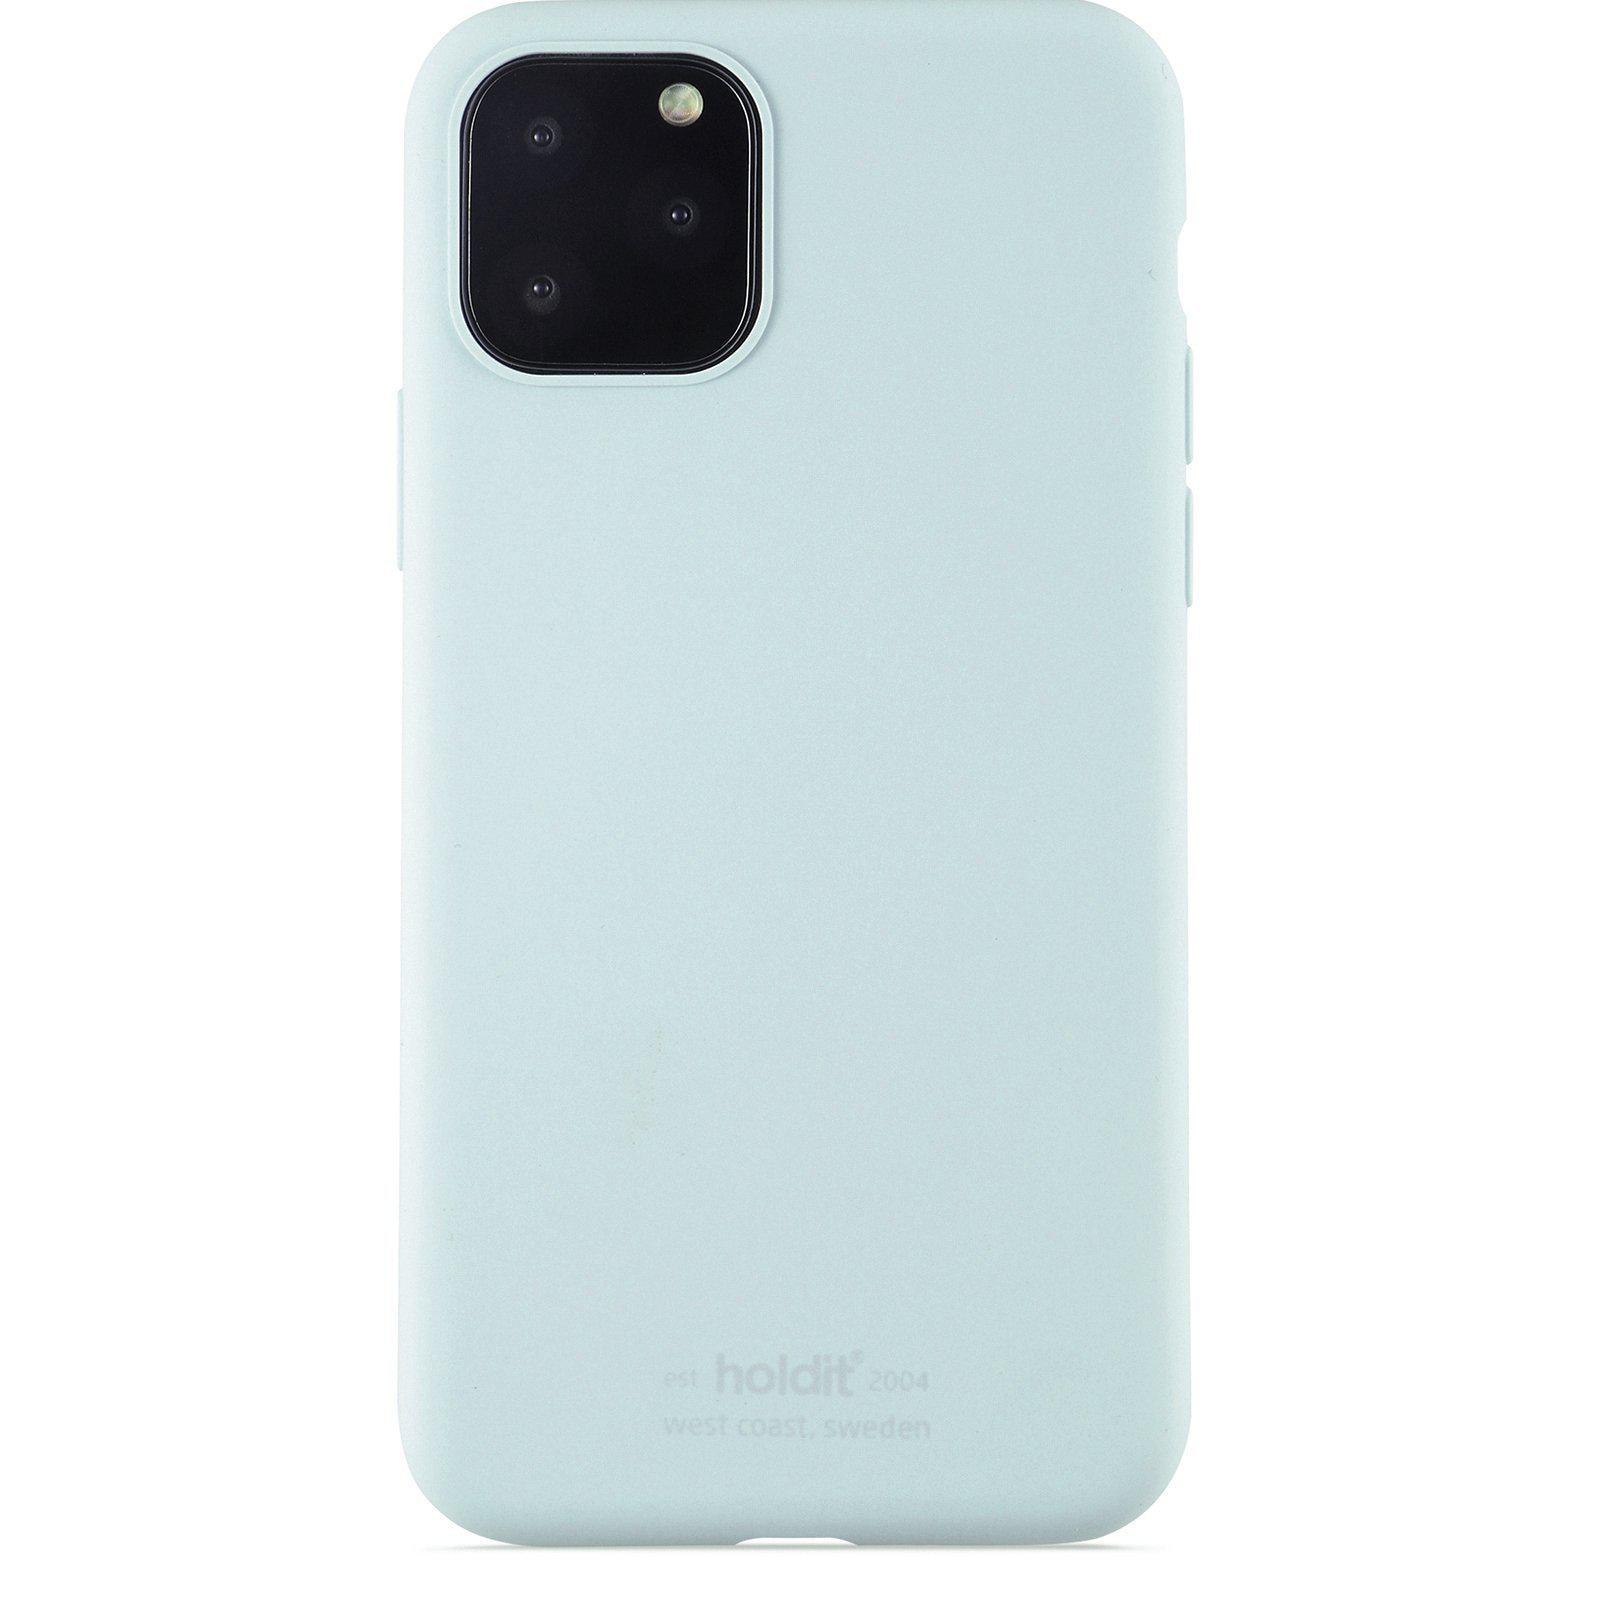 Silikonikuori iPhone 11 Pro/XS/X Mint